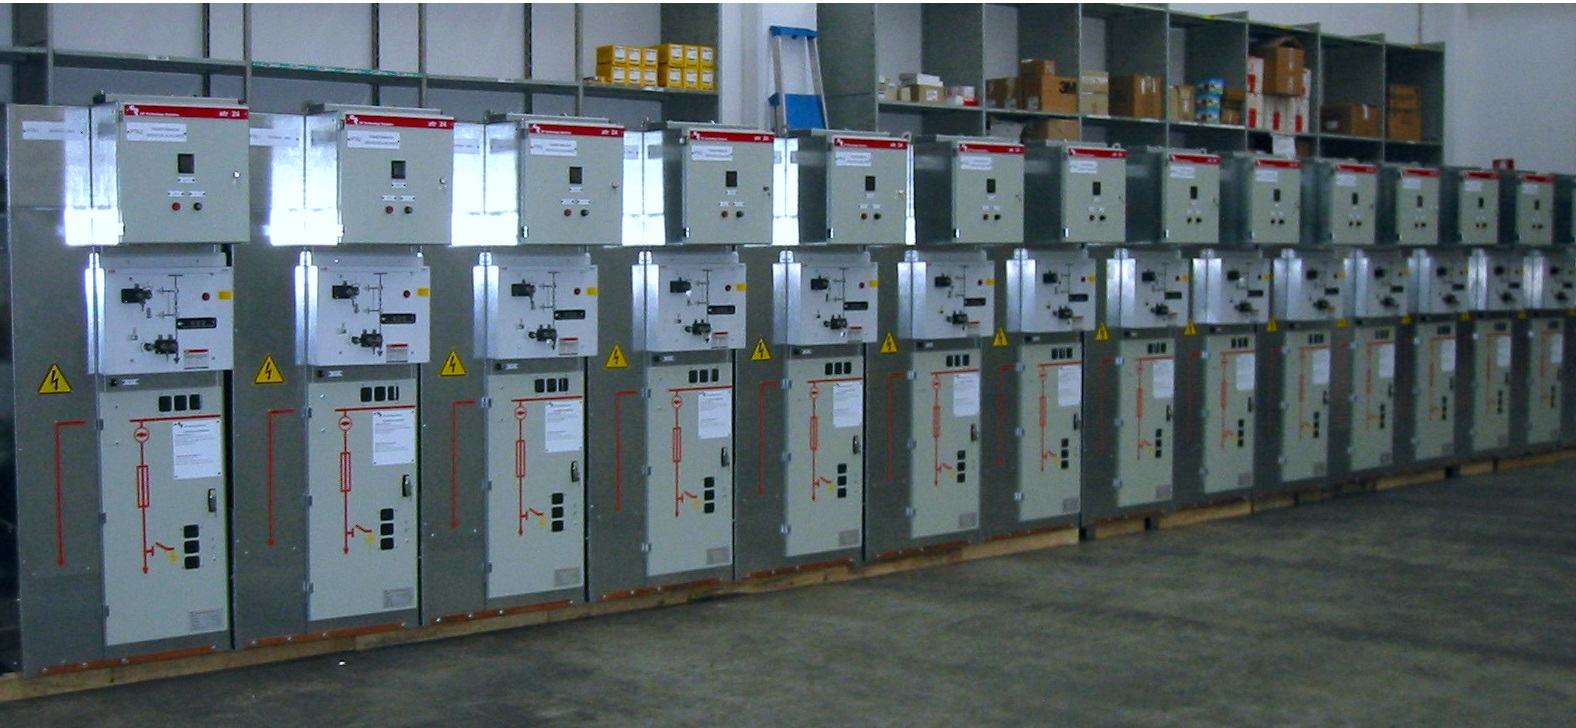 MV switchgear for Venezuela